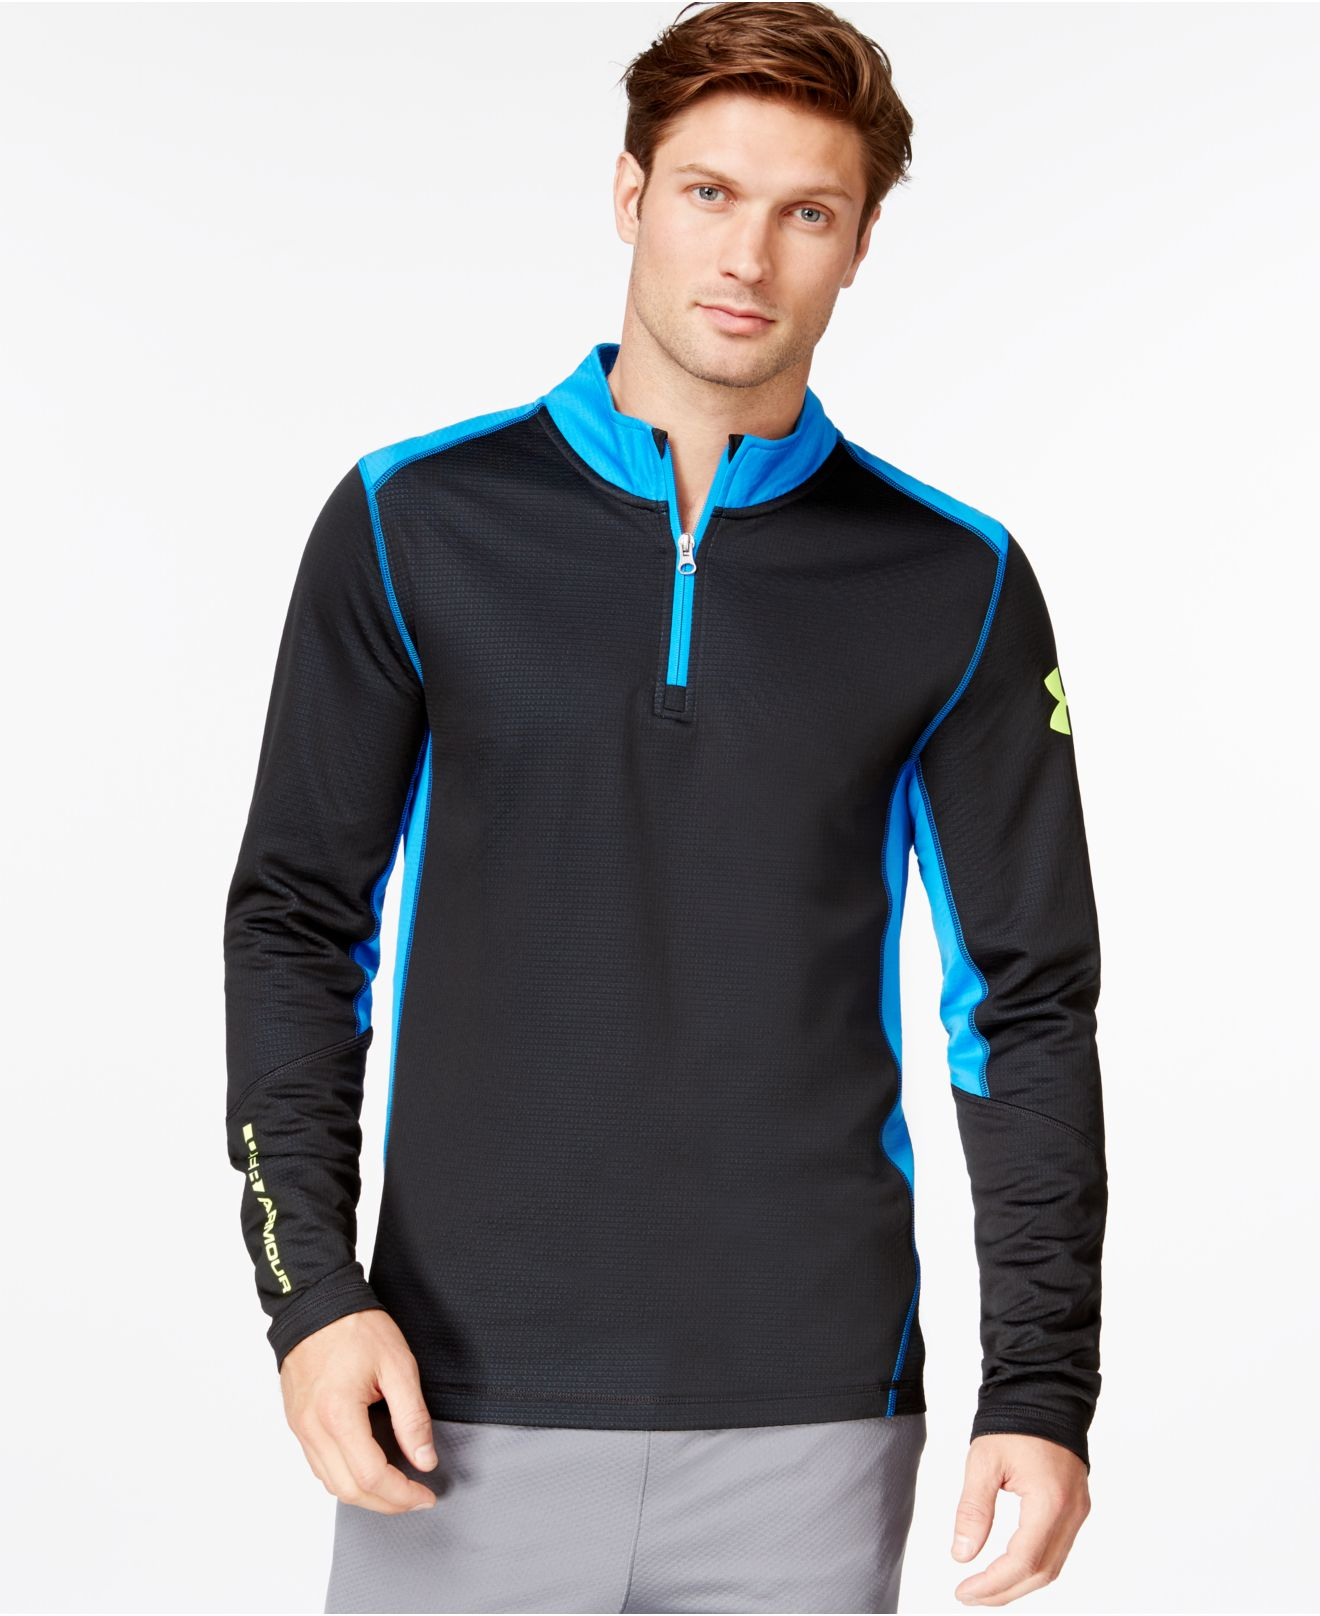 Under armour men 39 s coldgear infrared grid half zip long for Under armour half sleeve shirt